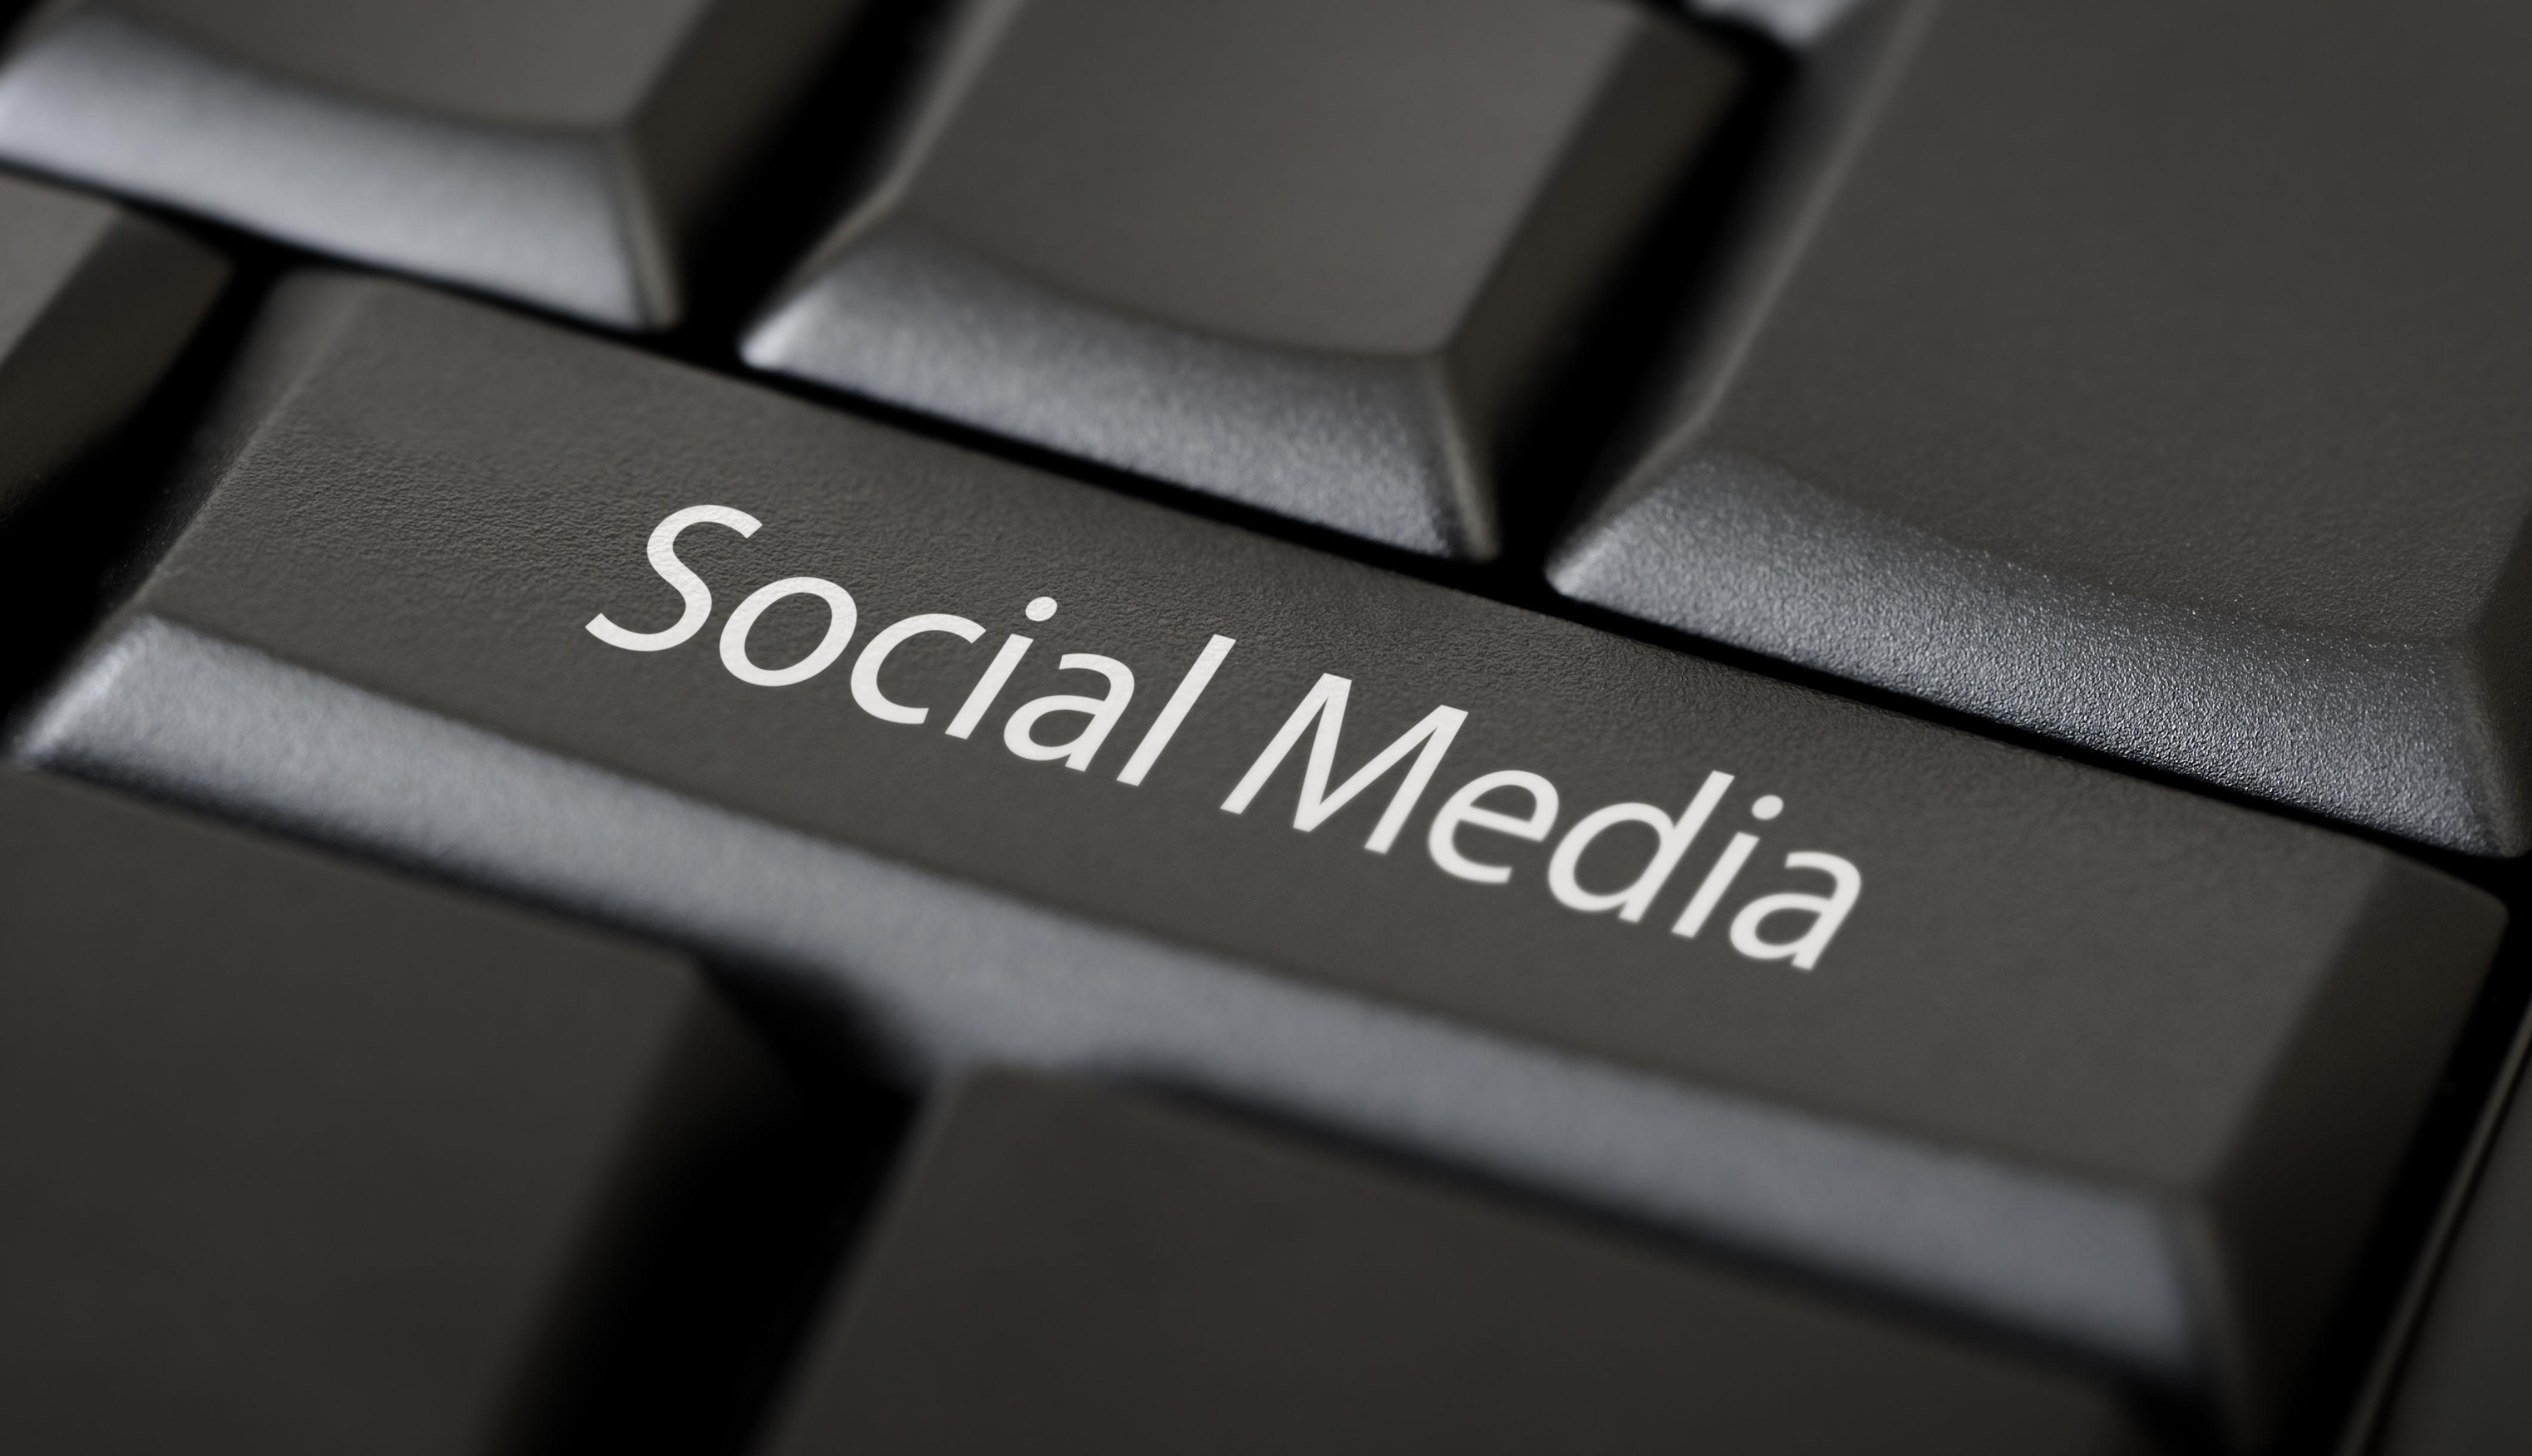 Social network marketing definition for Soil media definition